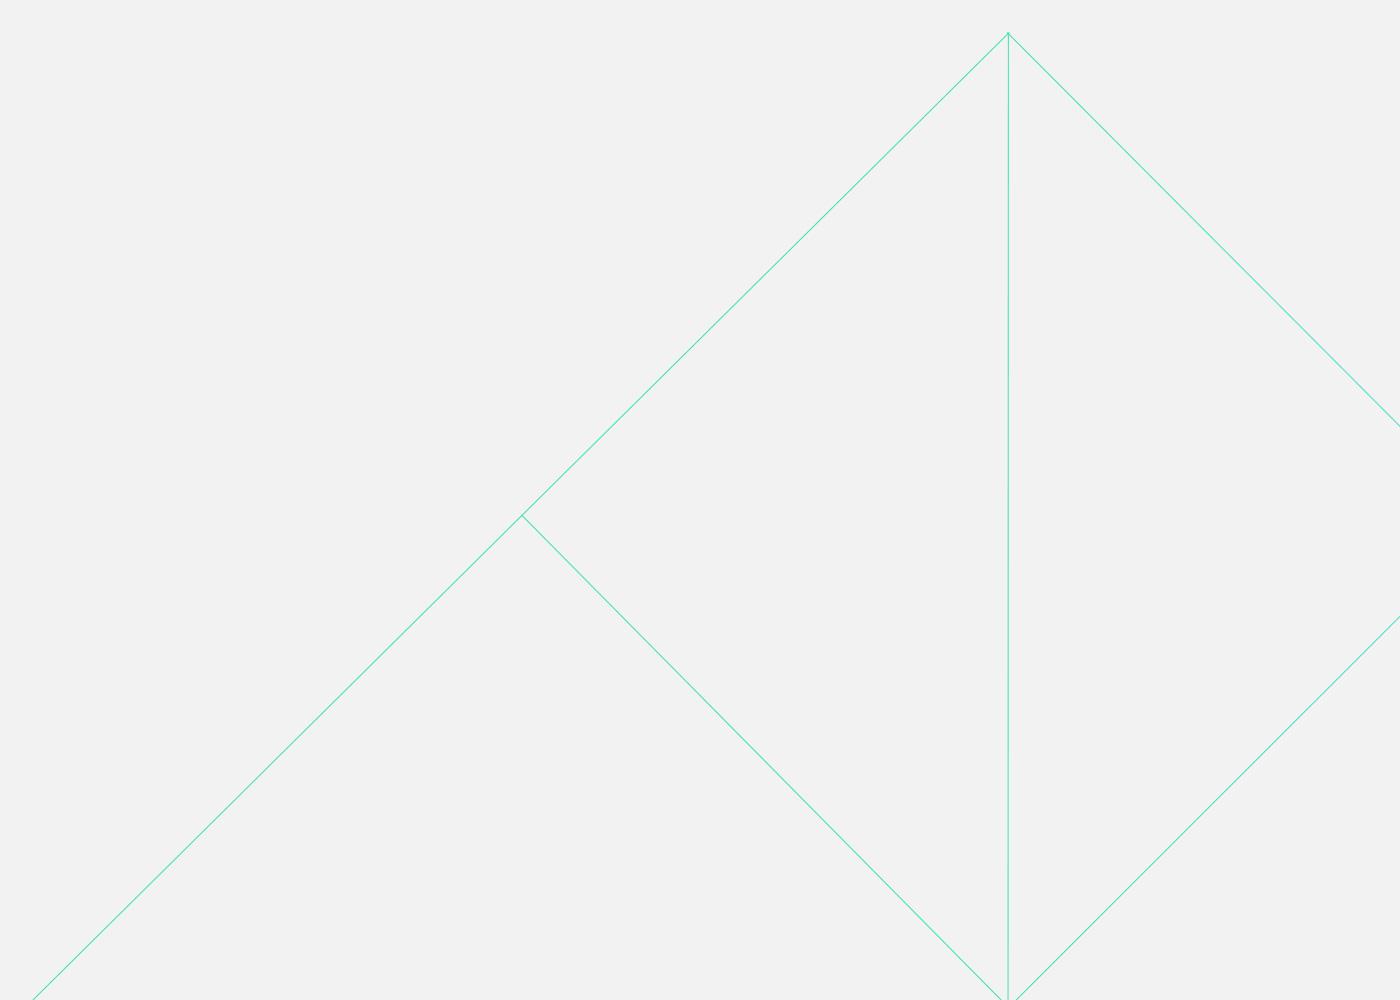 framework-image-01